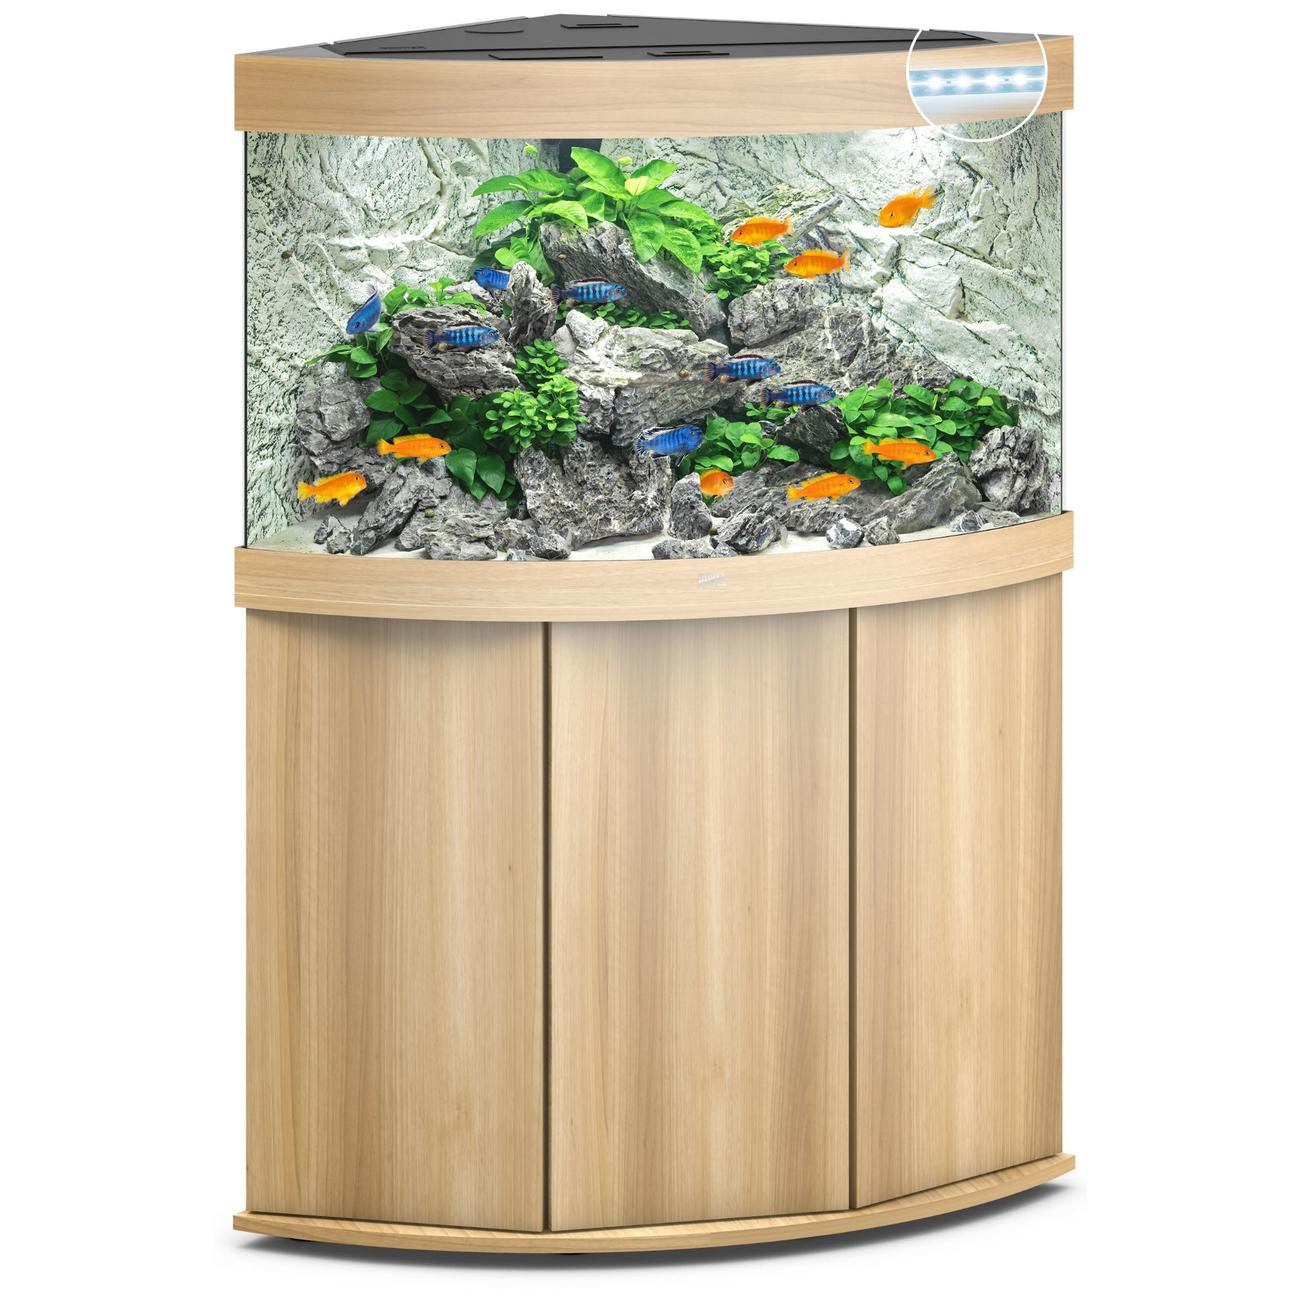 Juwel Trigon 190 LED Eck-Aquarium mit Unterschrank Bild 11